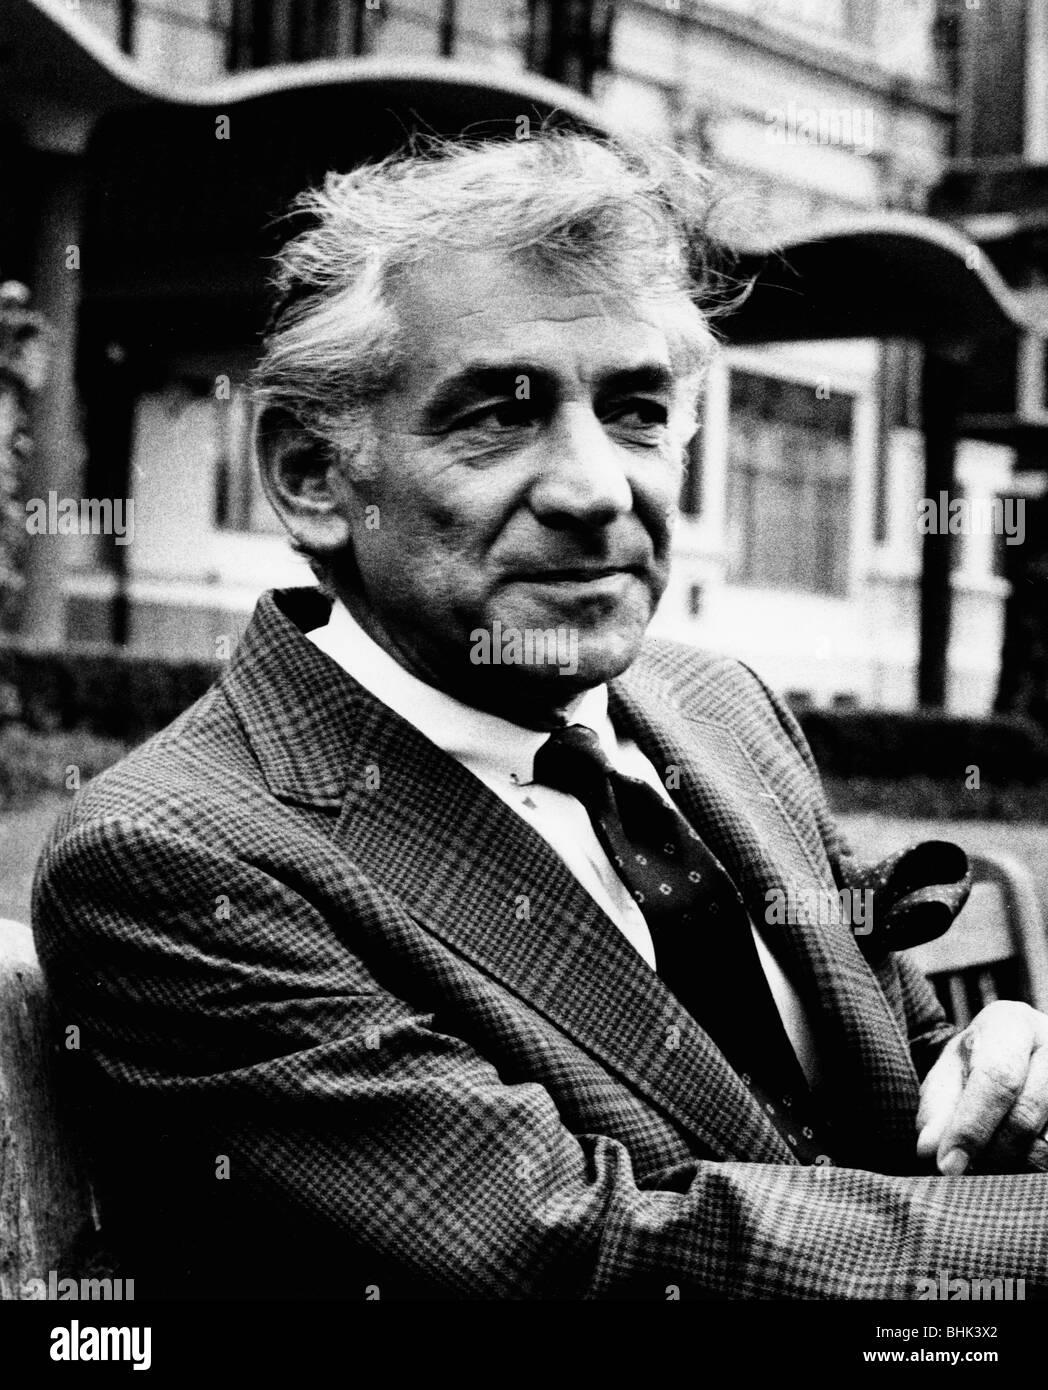 Leonard Bernstein (1918-1990), American composer, outside the Savoy Hotel, London. - Stock Image